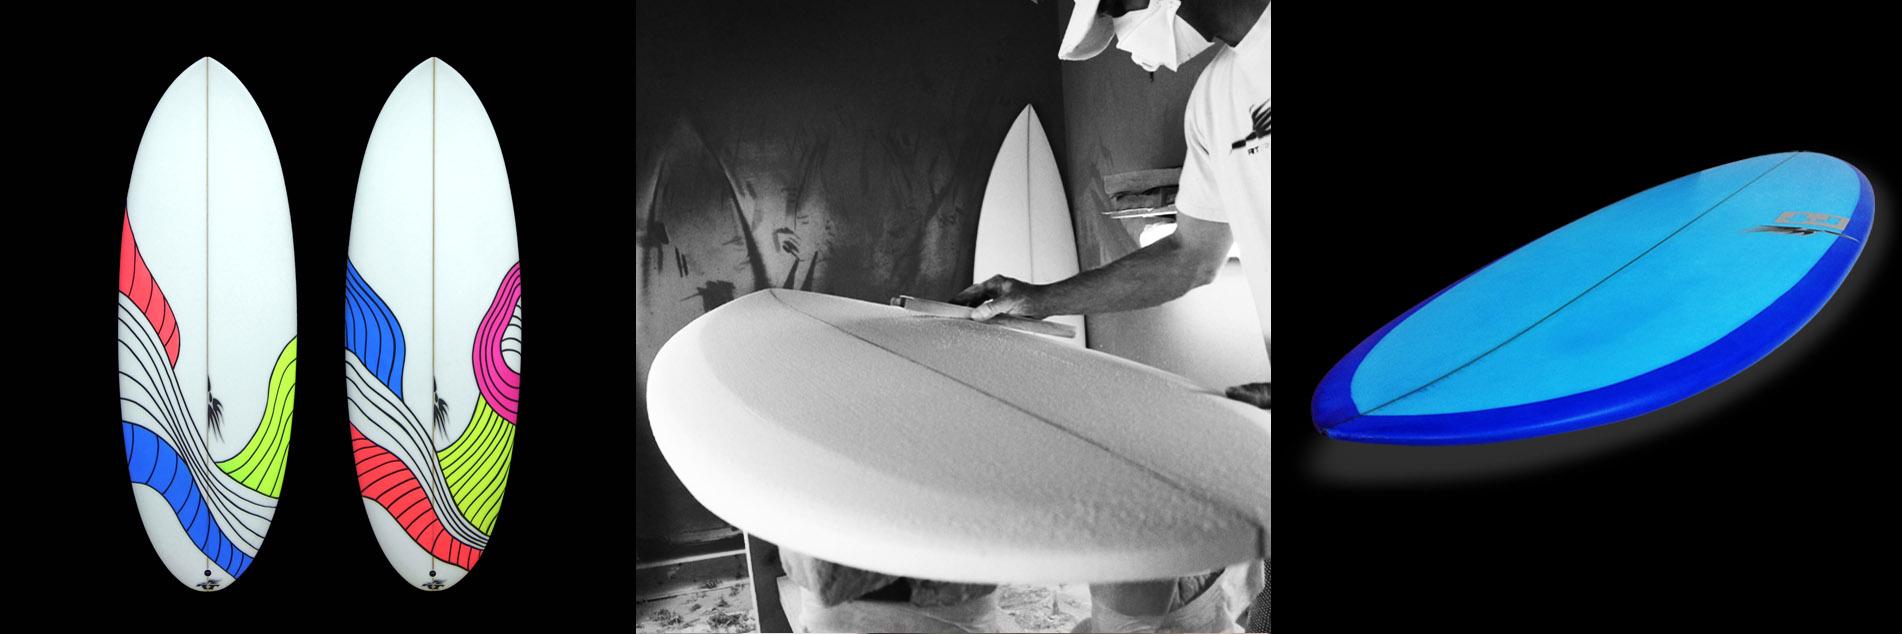 RTSurfboards_magiccarpet-04